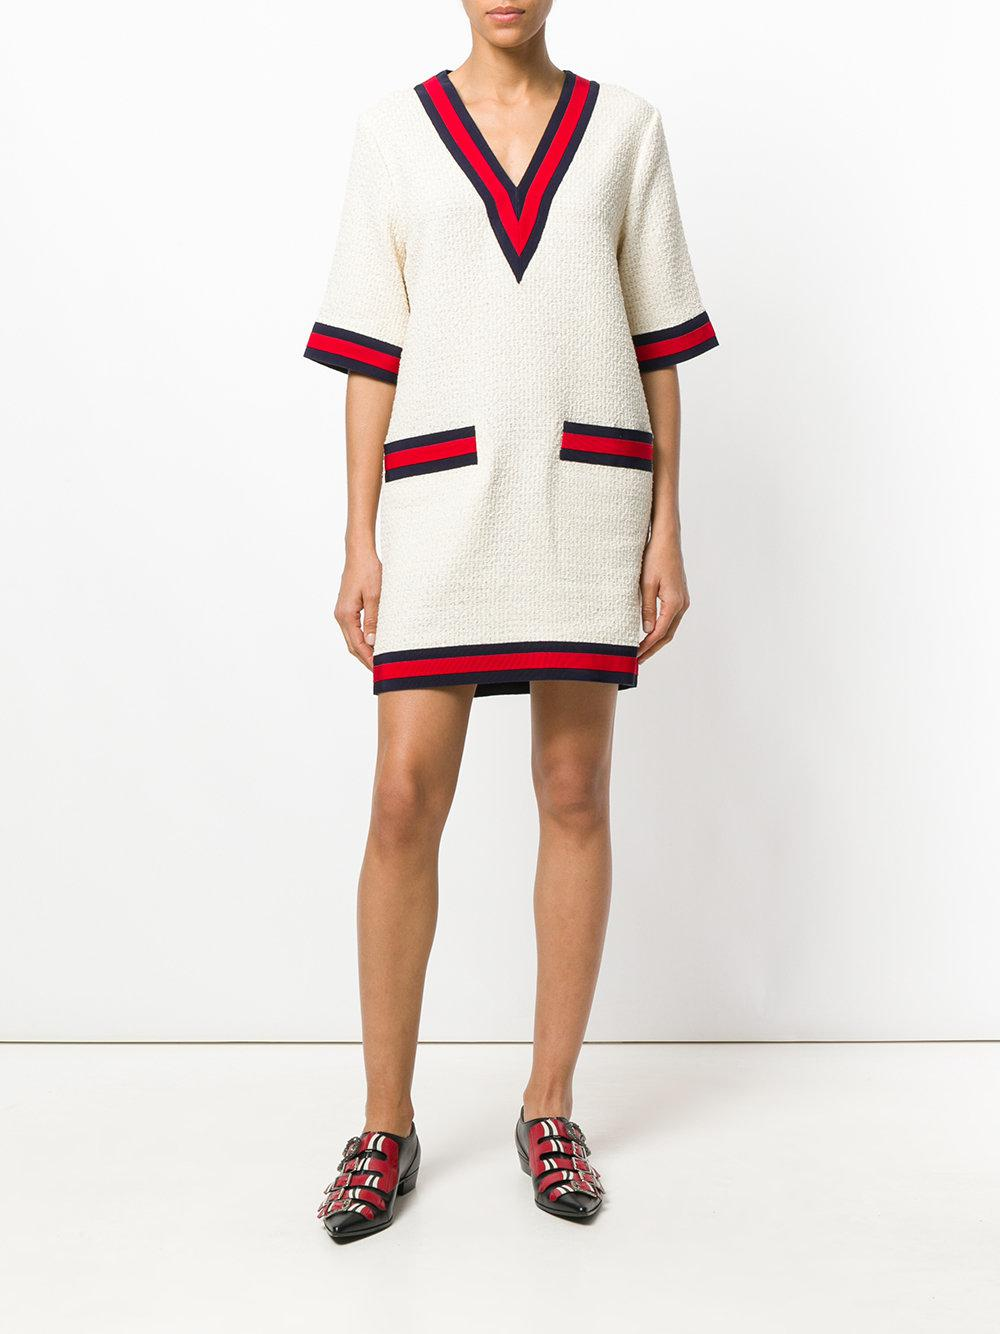 5bbb3edd6 Gucci Cotton-blend Sweater Dress in White - Lyst